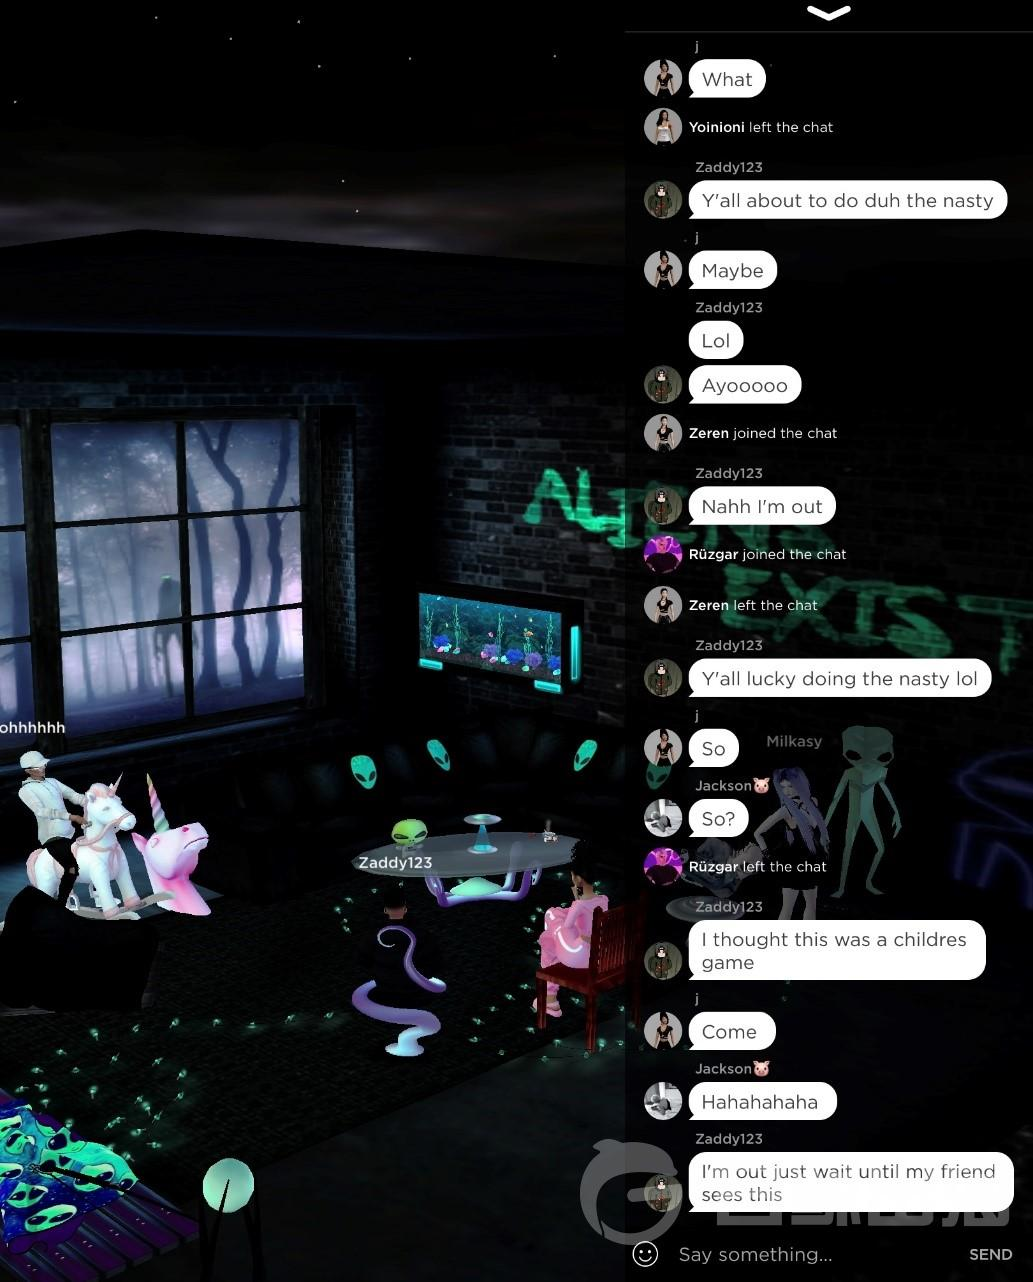 chat room in IMVU